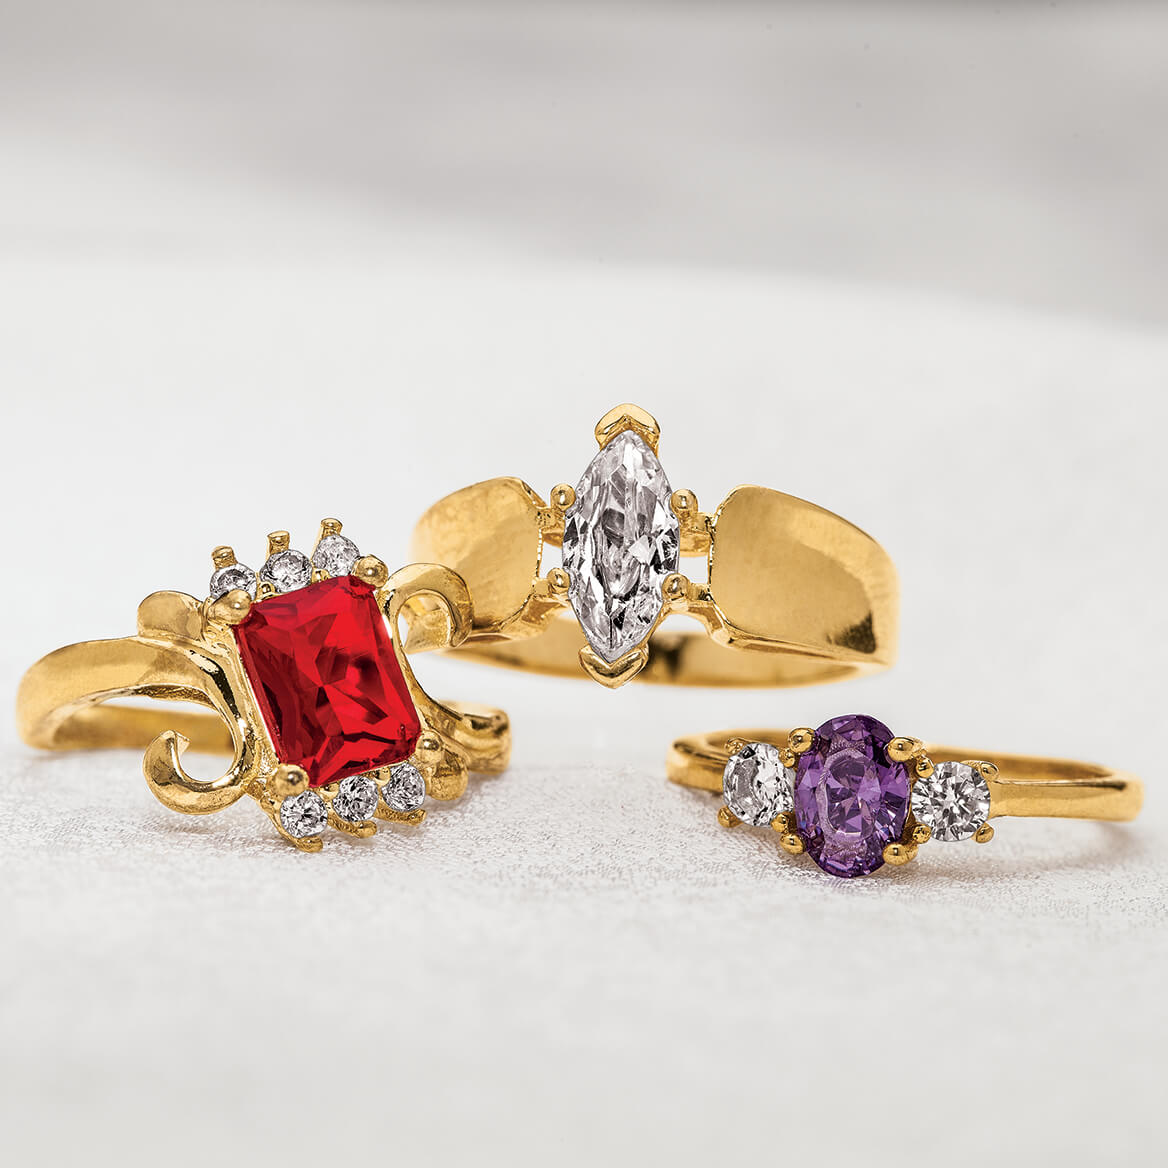 Fashion Rings, Set of 3-366710